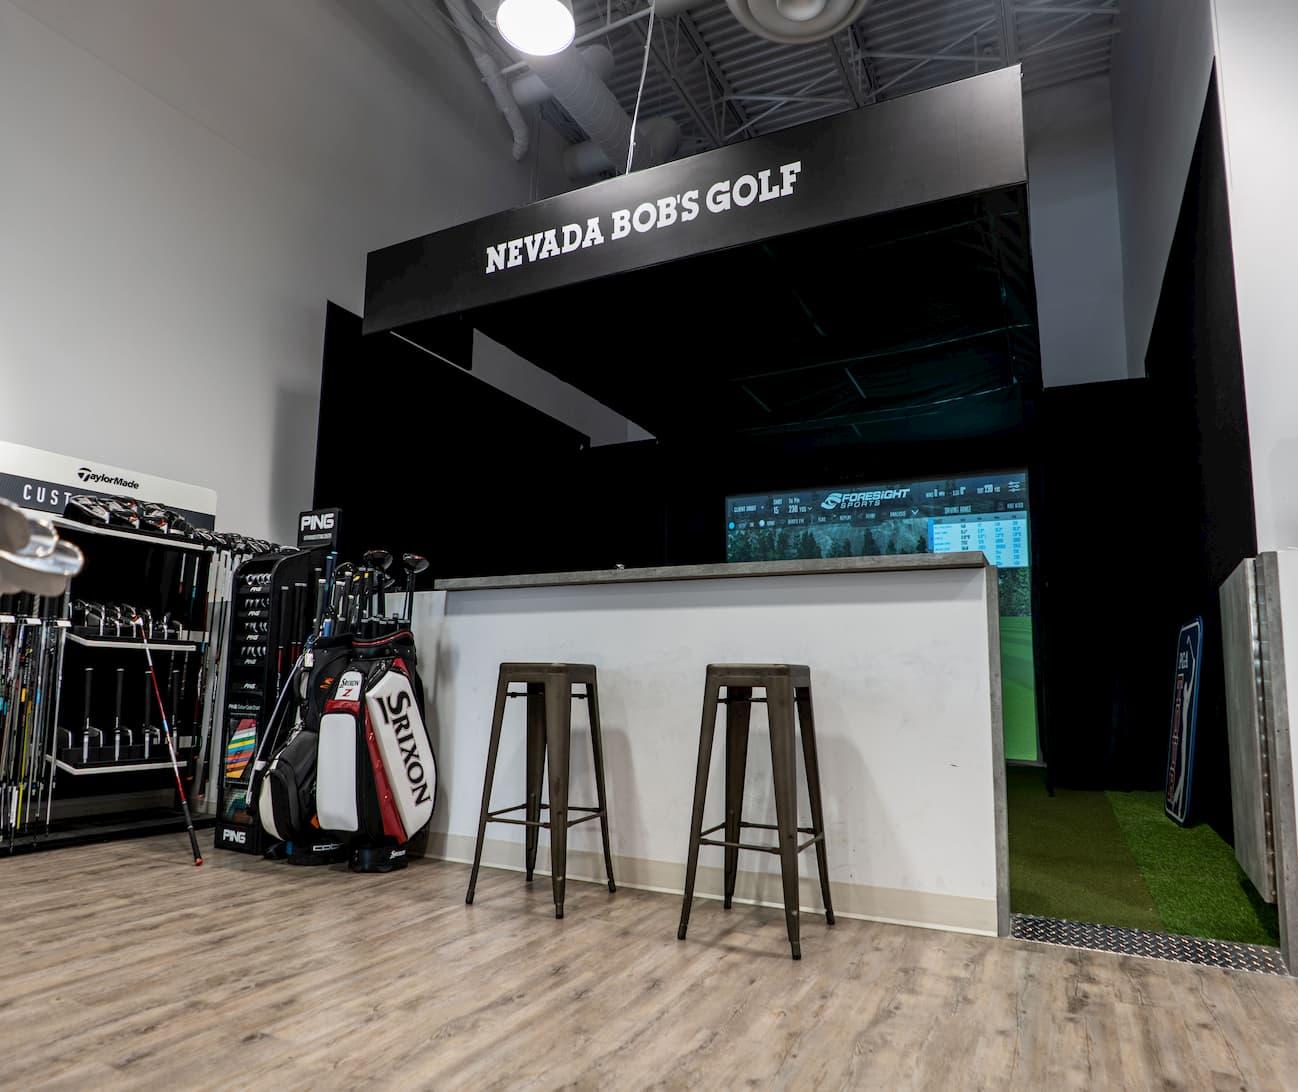 Installation cage commerce de golf